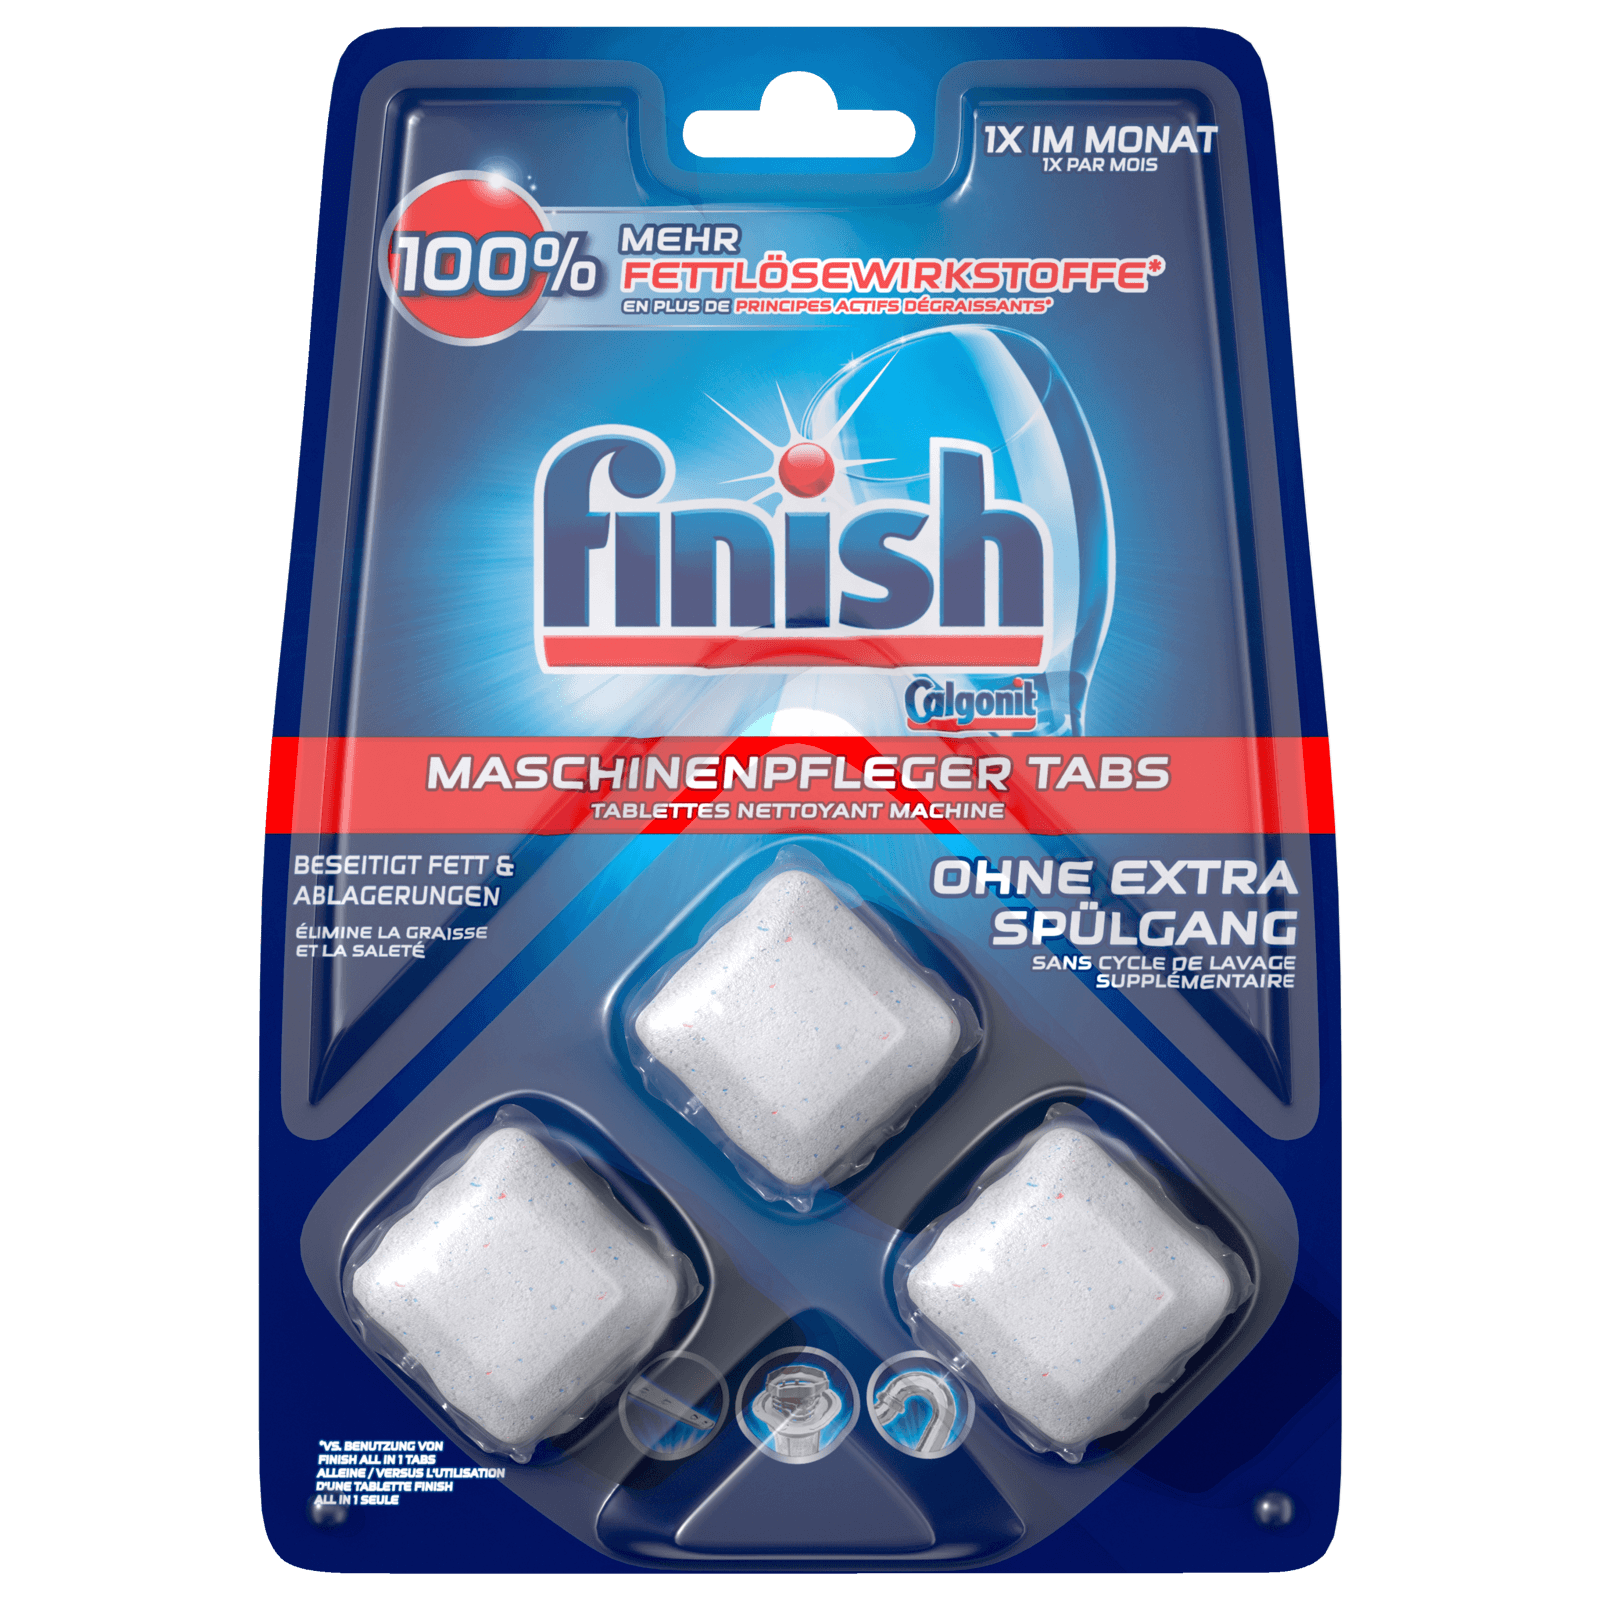 Finish Maschinenpfleger Tabs 3 Stück